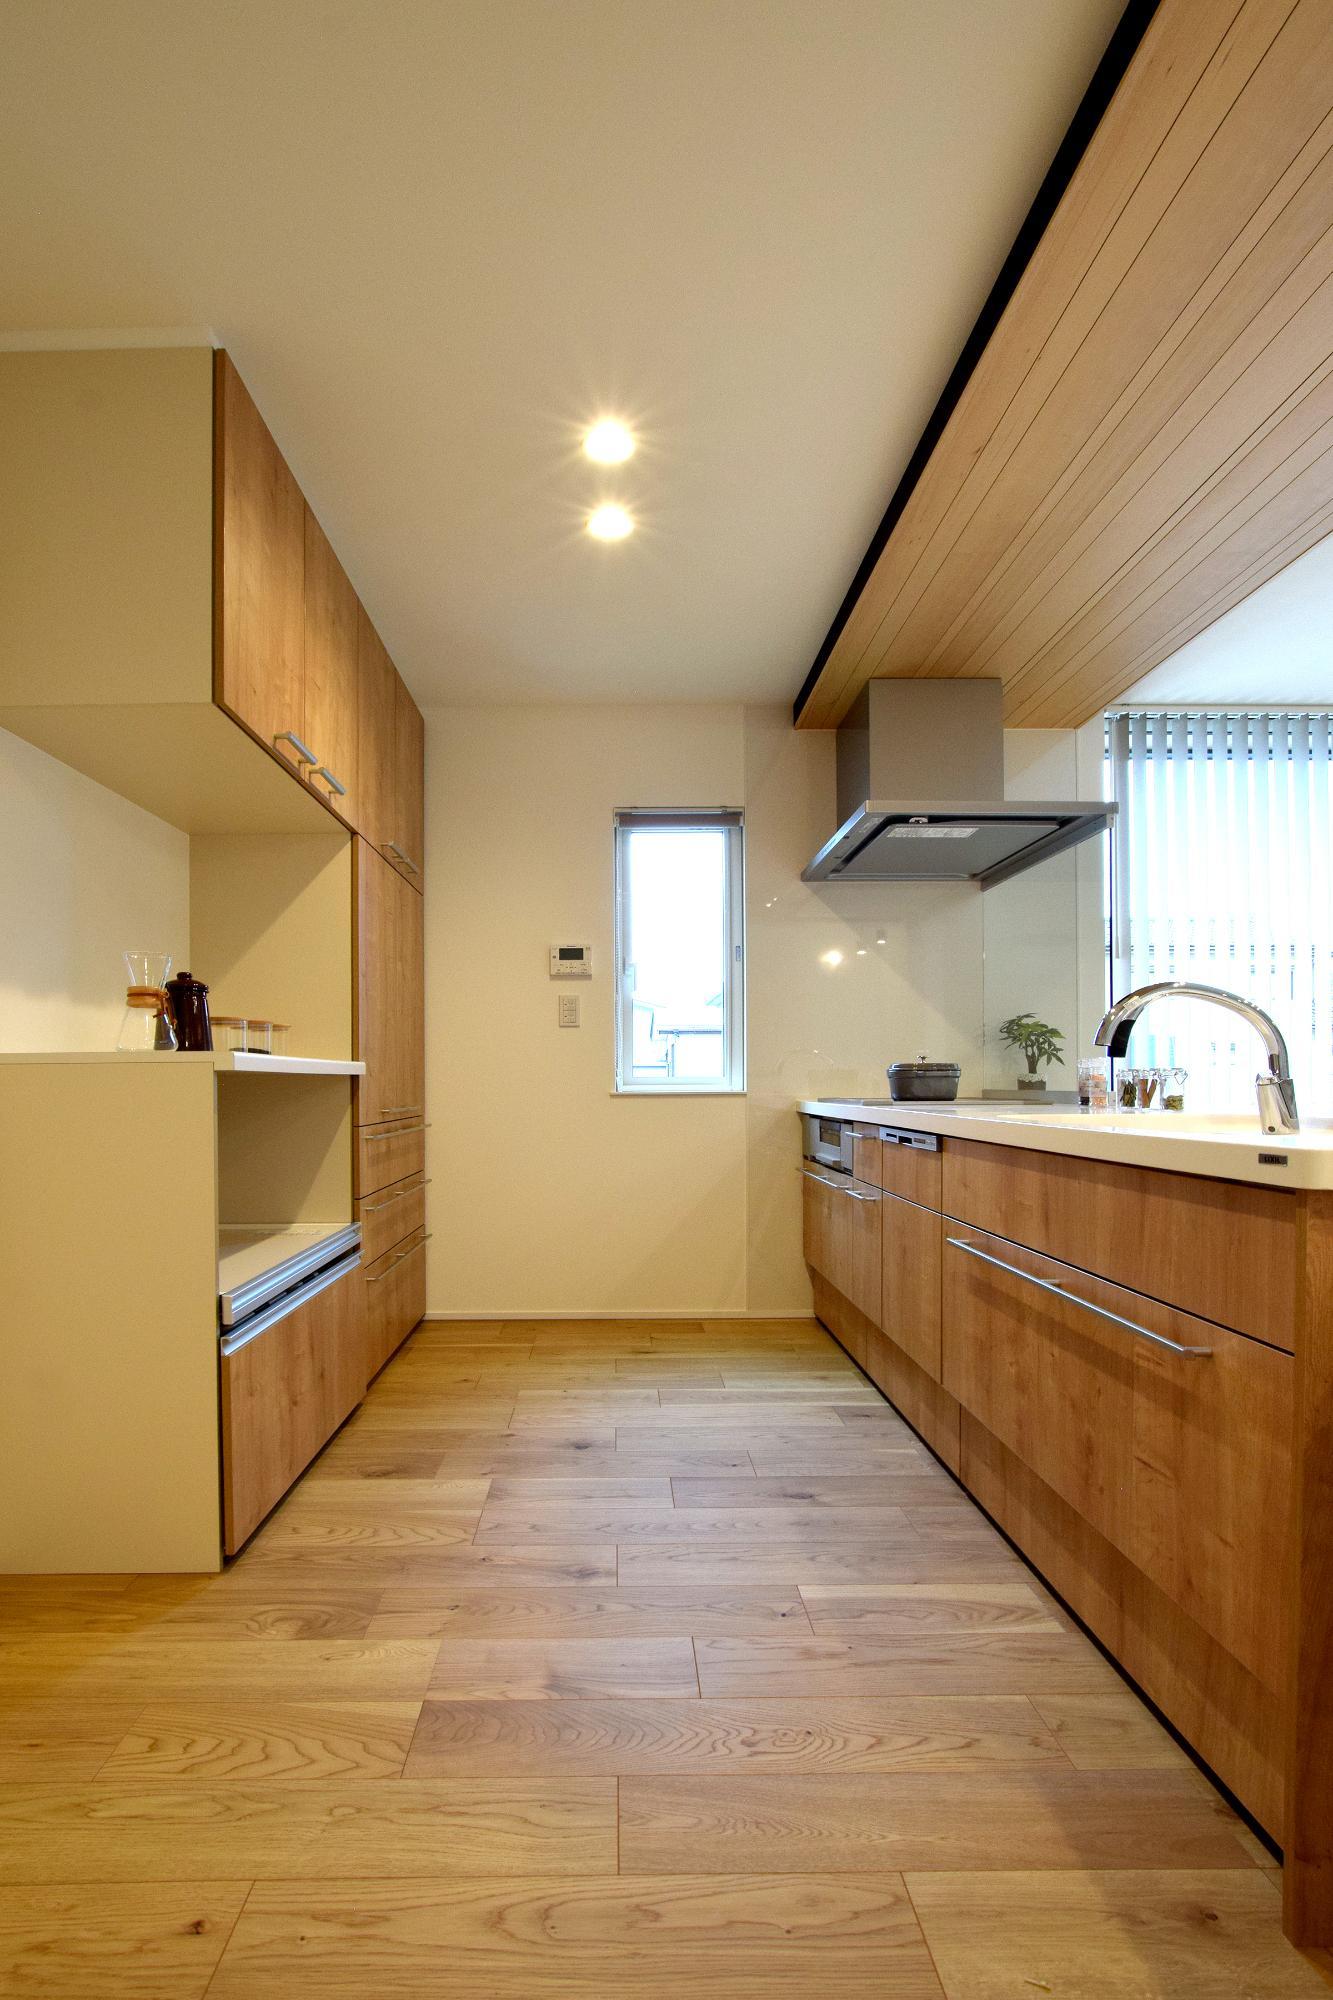 DETAIL HOME(ディテールホーム)「親の同居を見据えた機能住宅」のシンプル・ナチュラル・モダンなキッチンの実例写真